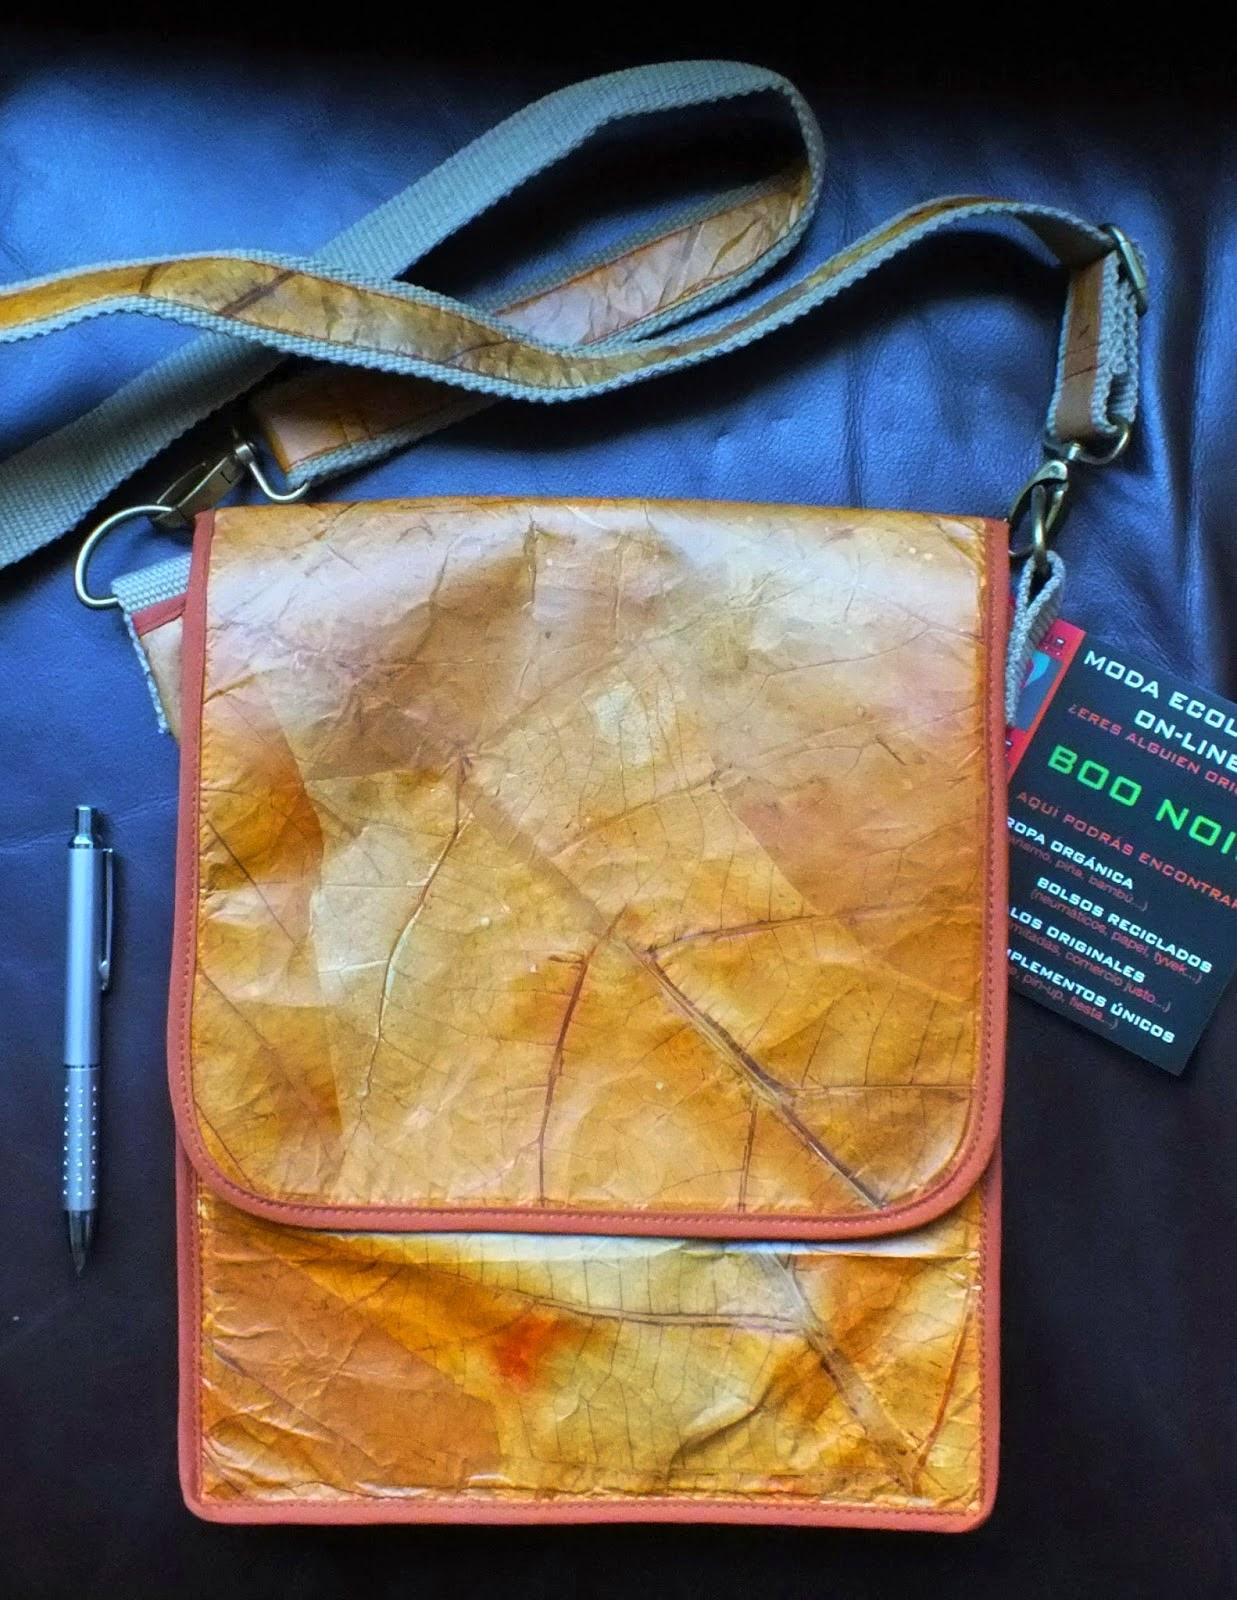 ropa organica ecologica madrid